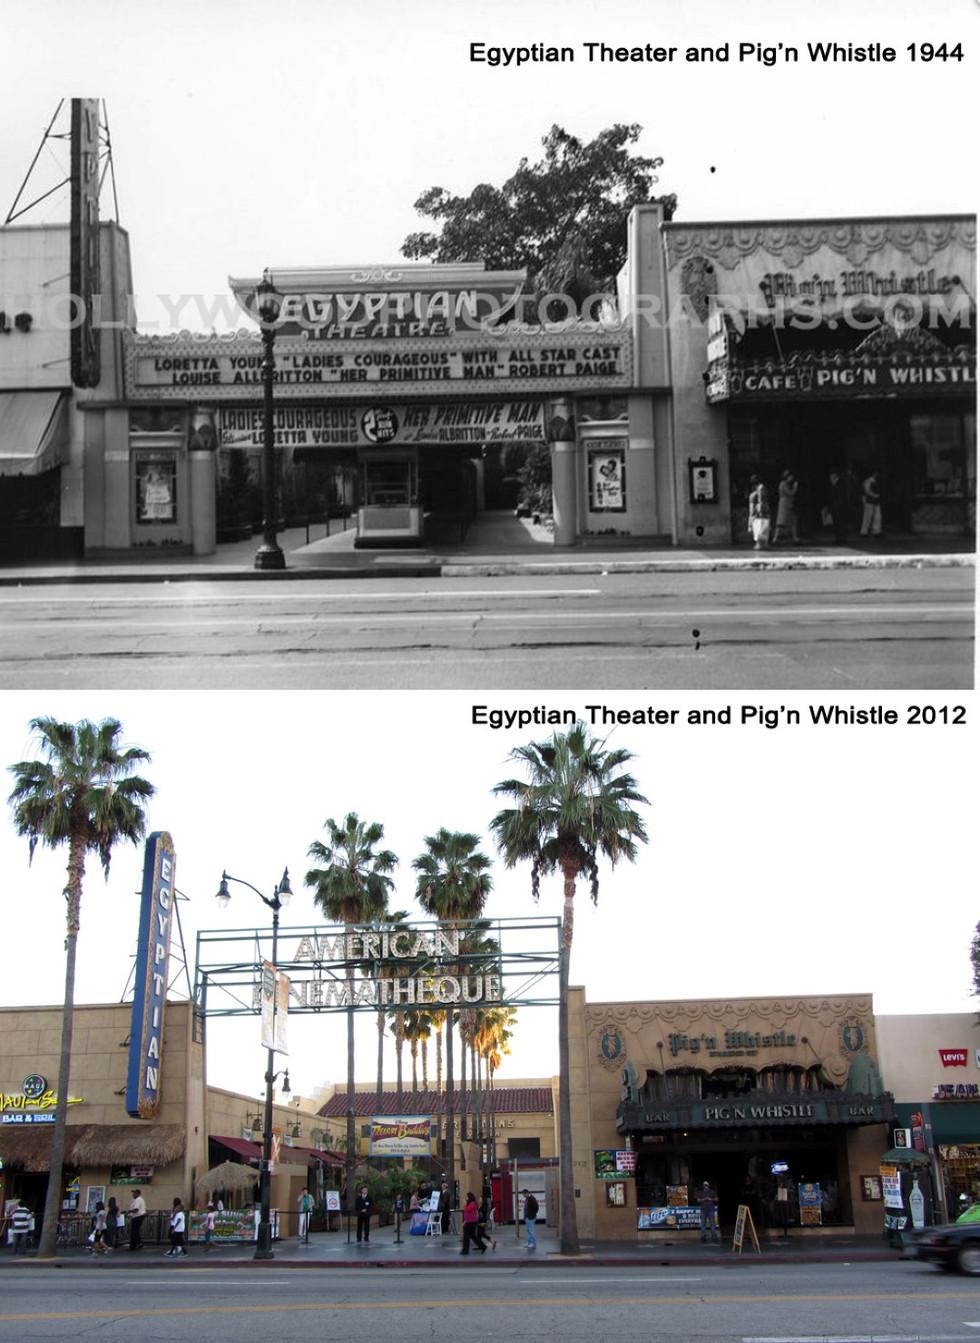 Egyptian & Pig n Whistle 1944 & 2012